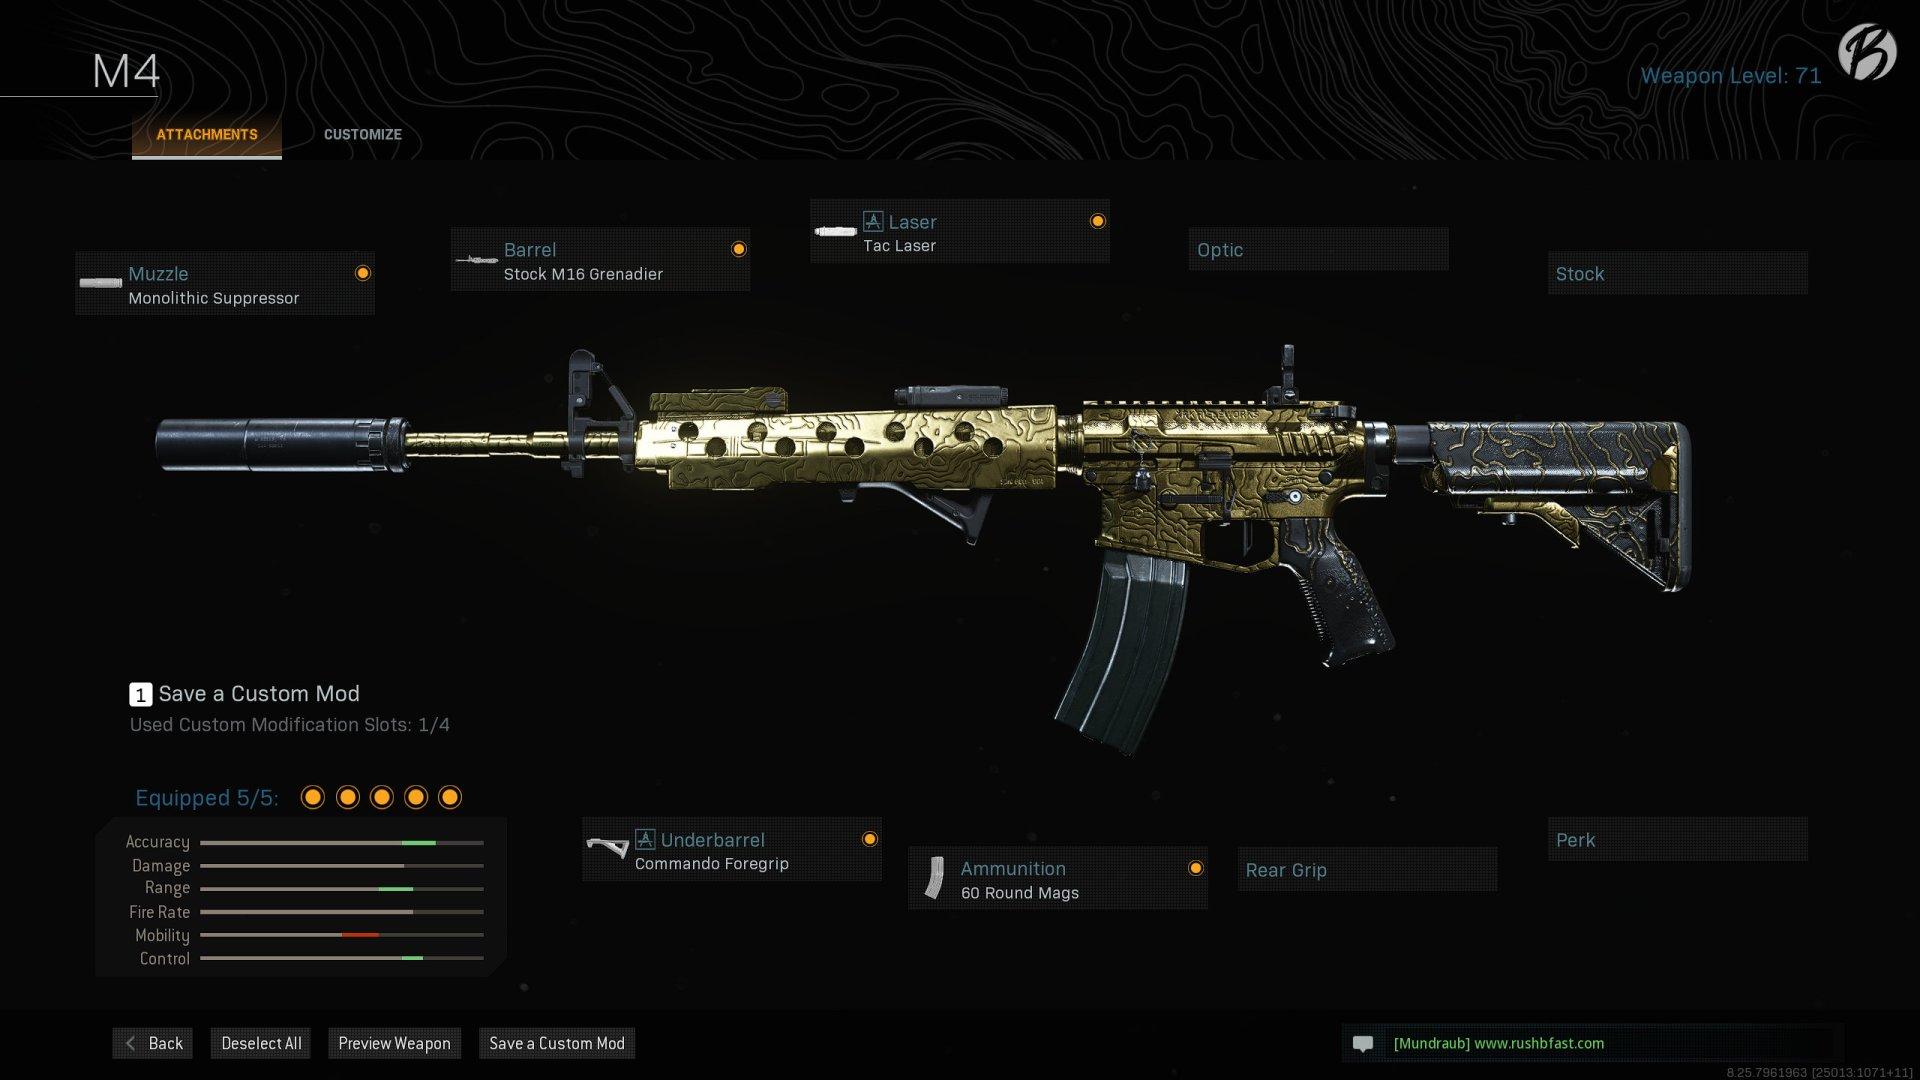 M4A1: Monolithic Suppressor, Stock M16 Grenadier, Tac Laser, Commando Foregrip, 60 Round Mags